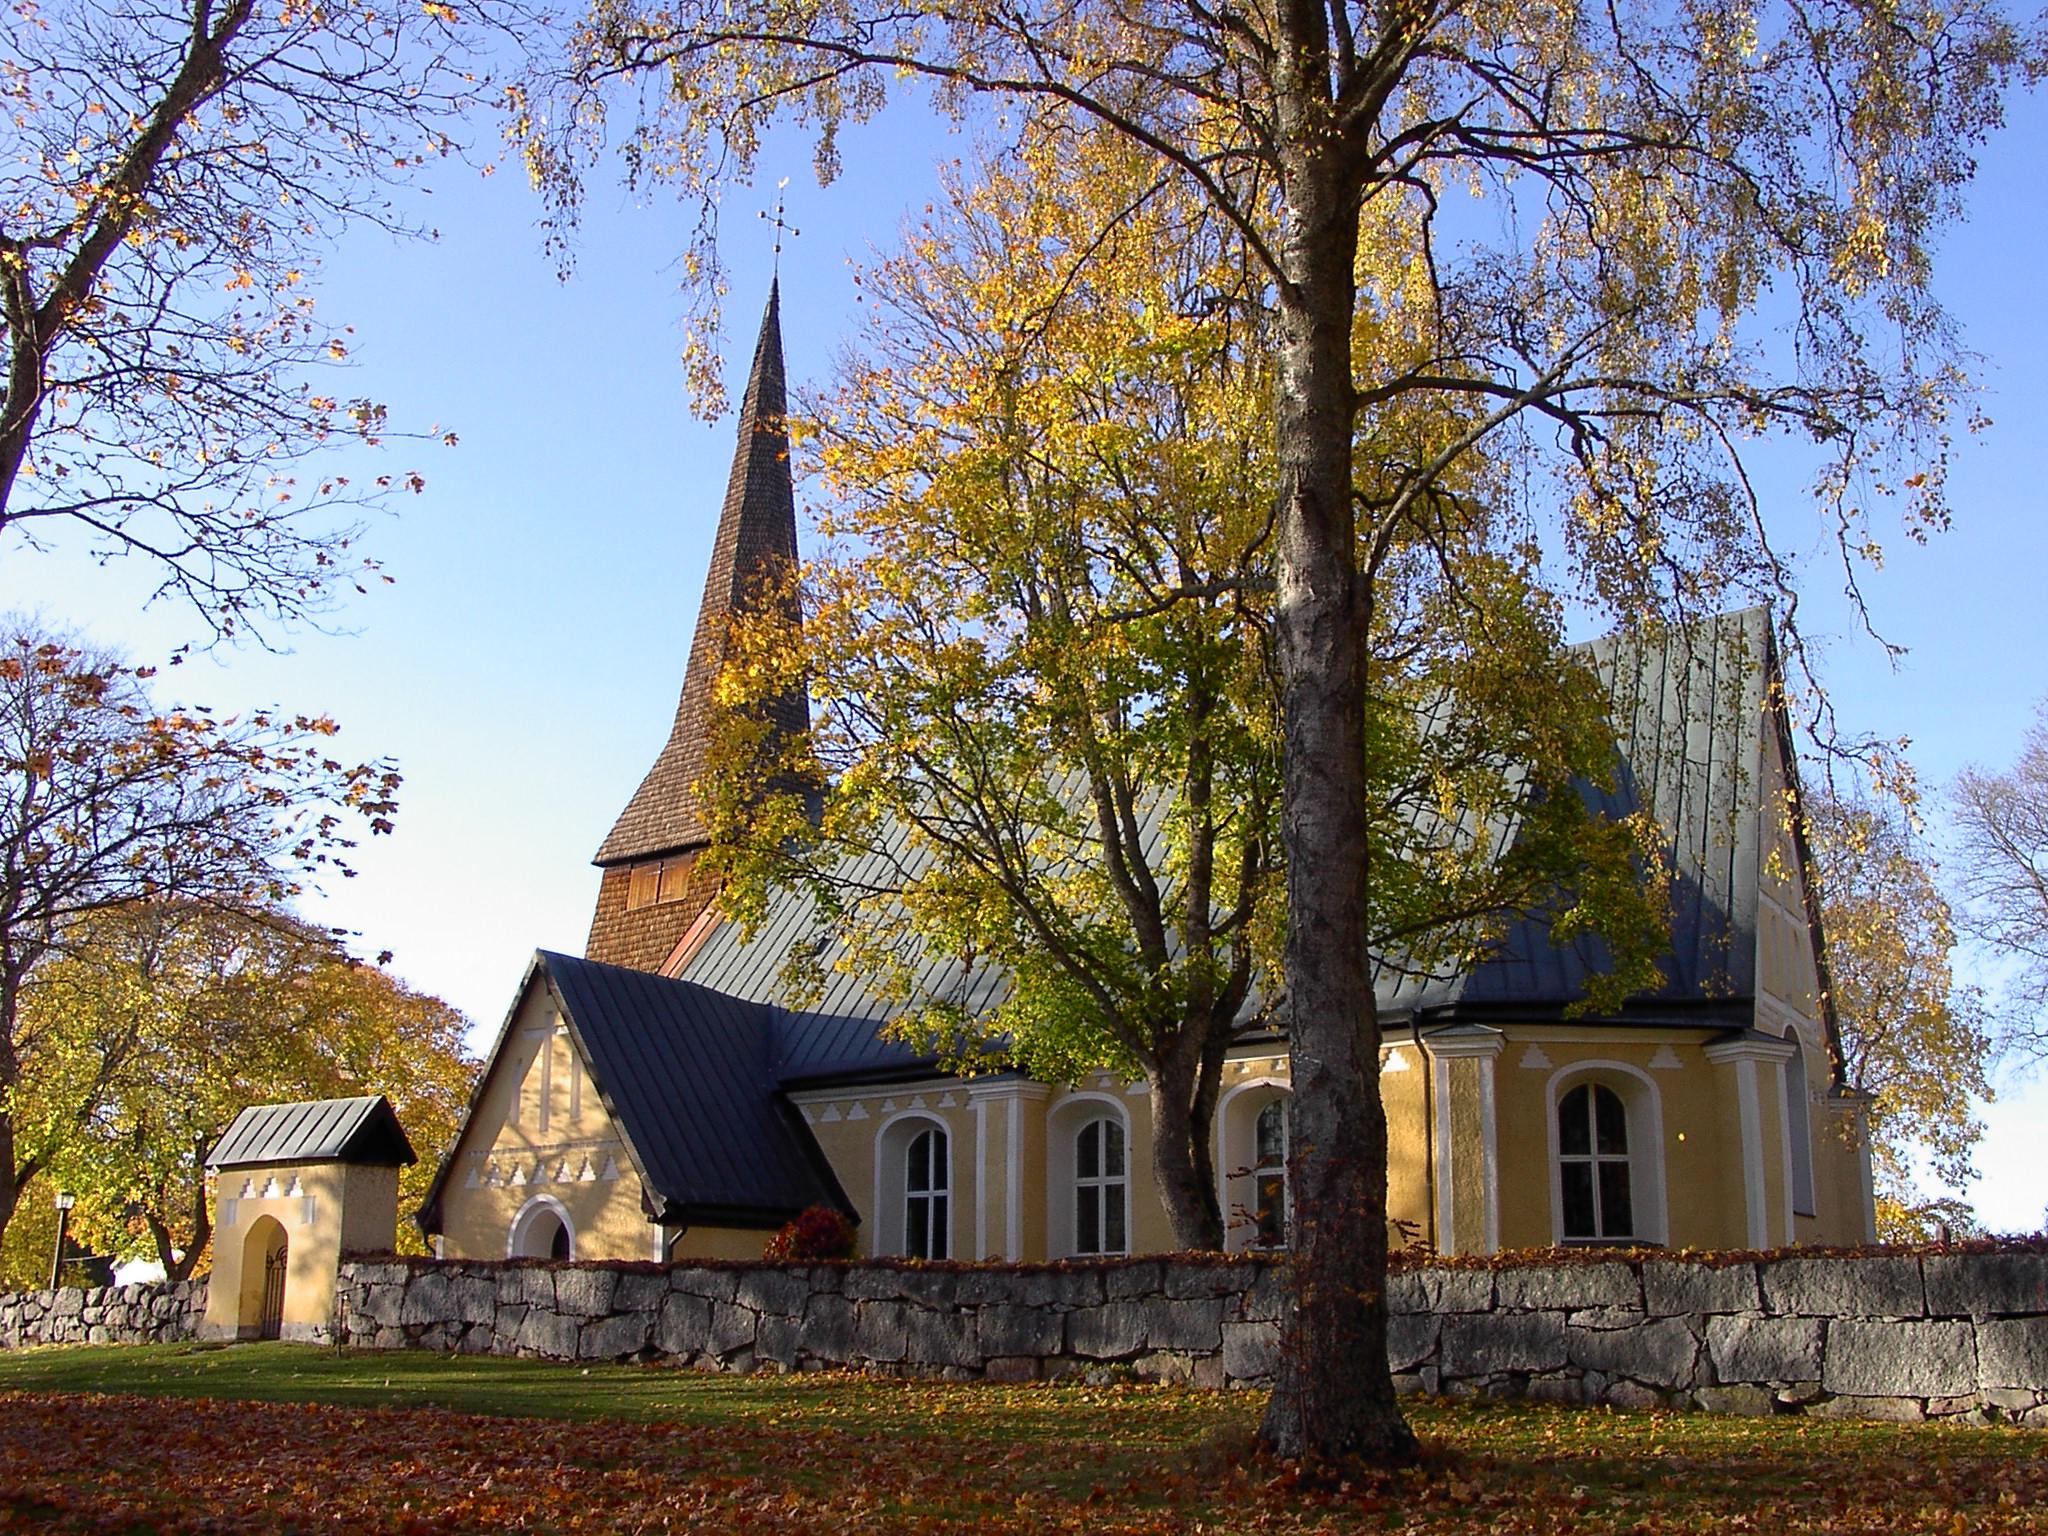 File:Malma kyrka Köping.jpg.